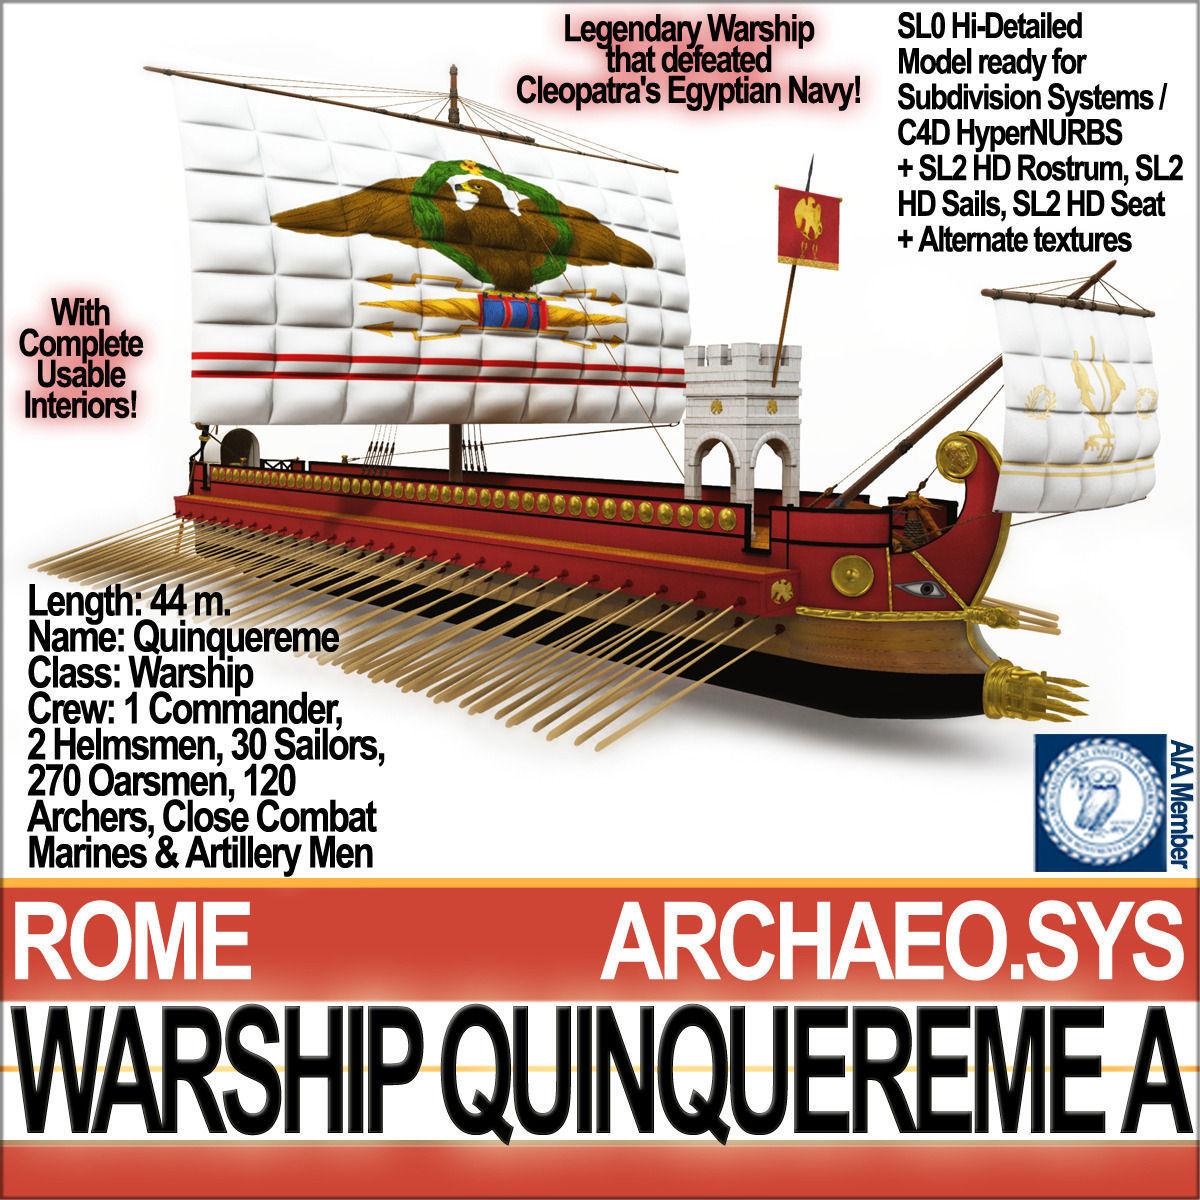 Roman Warship Quinquereme A